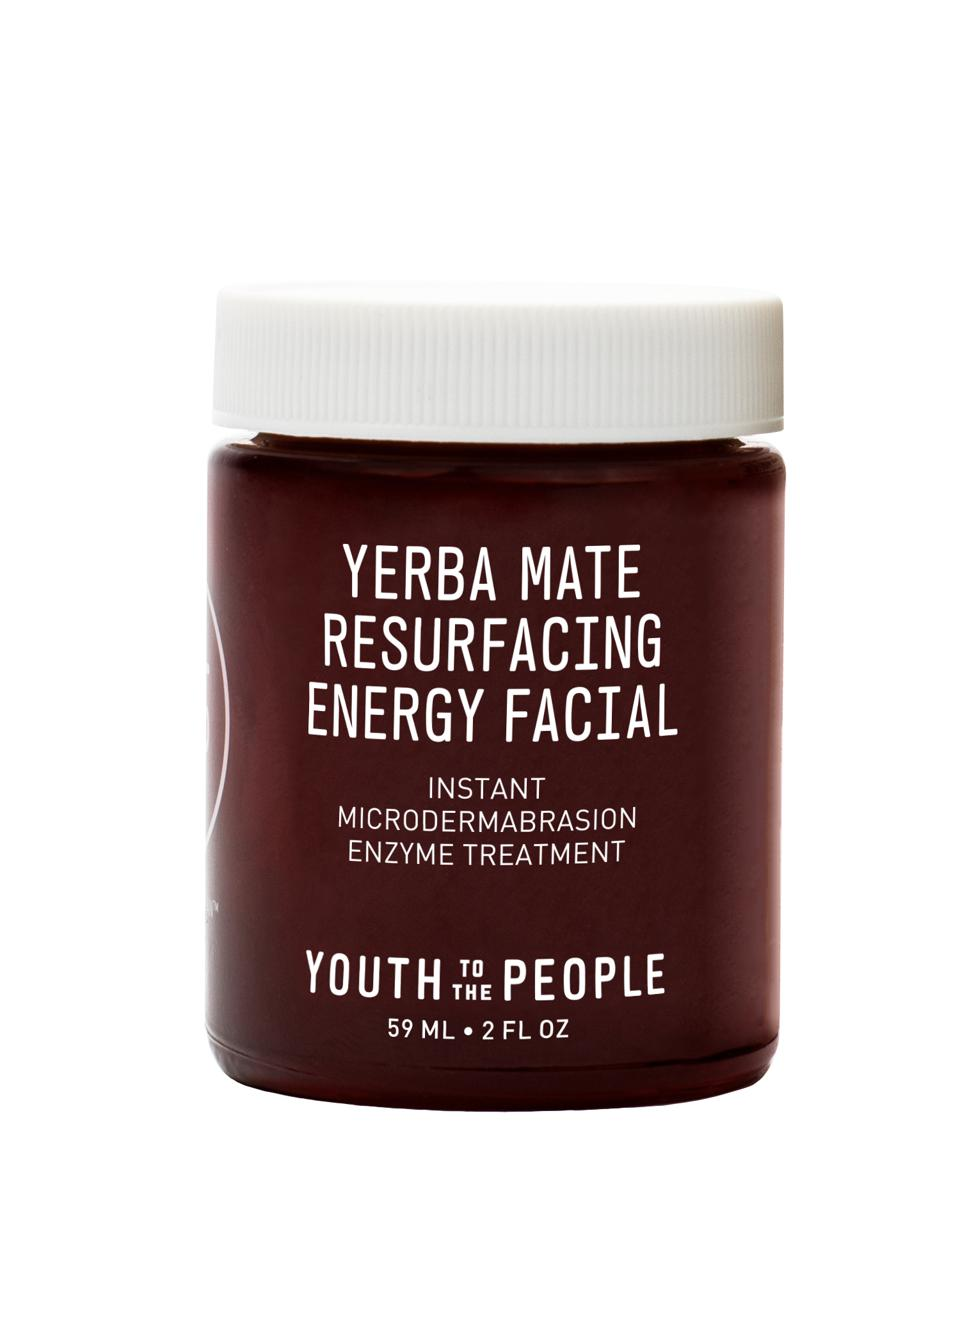 Youth to the People Yerba Mate Resurfacing Energy Facial